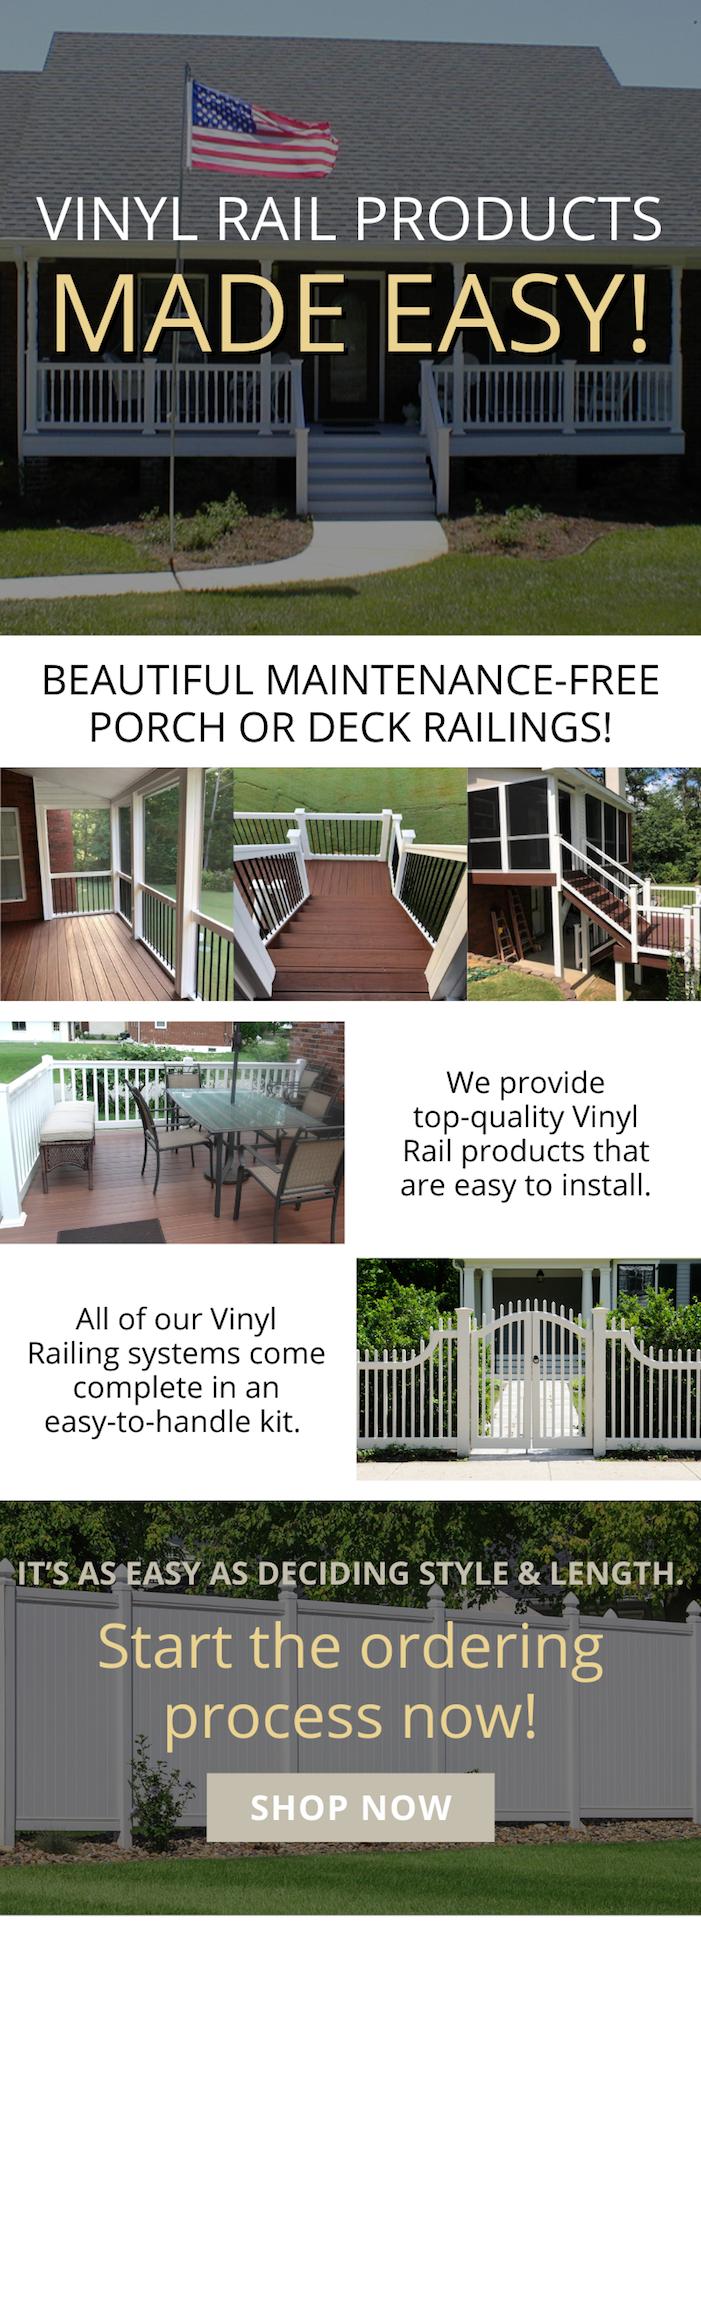 Vinyl Rail Depot July 2021 Email